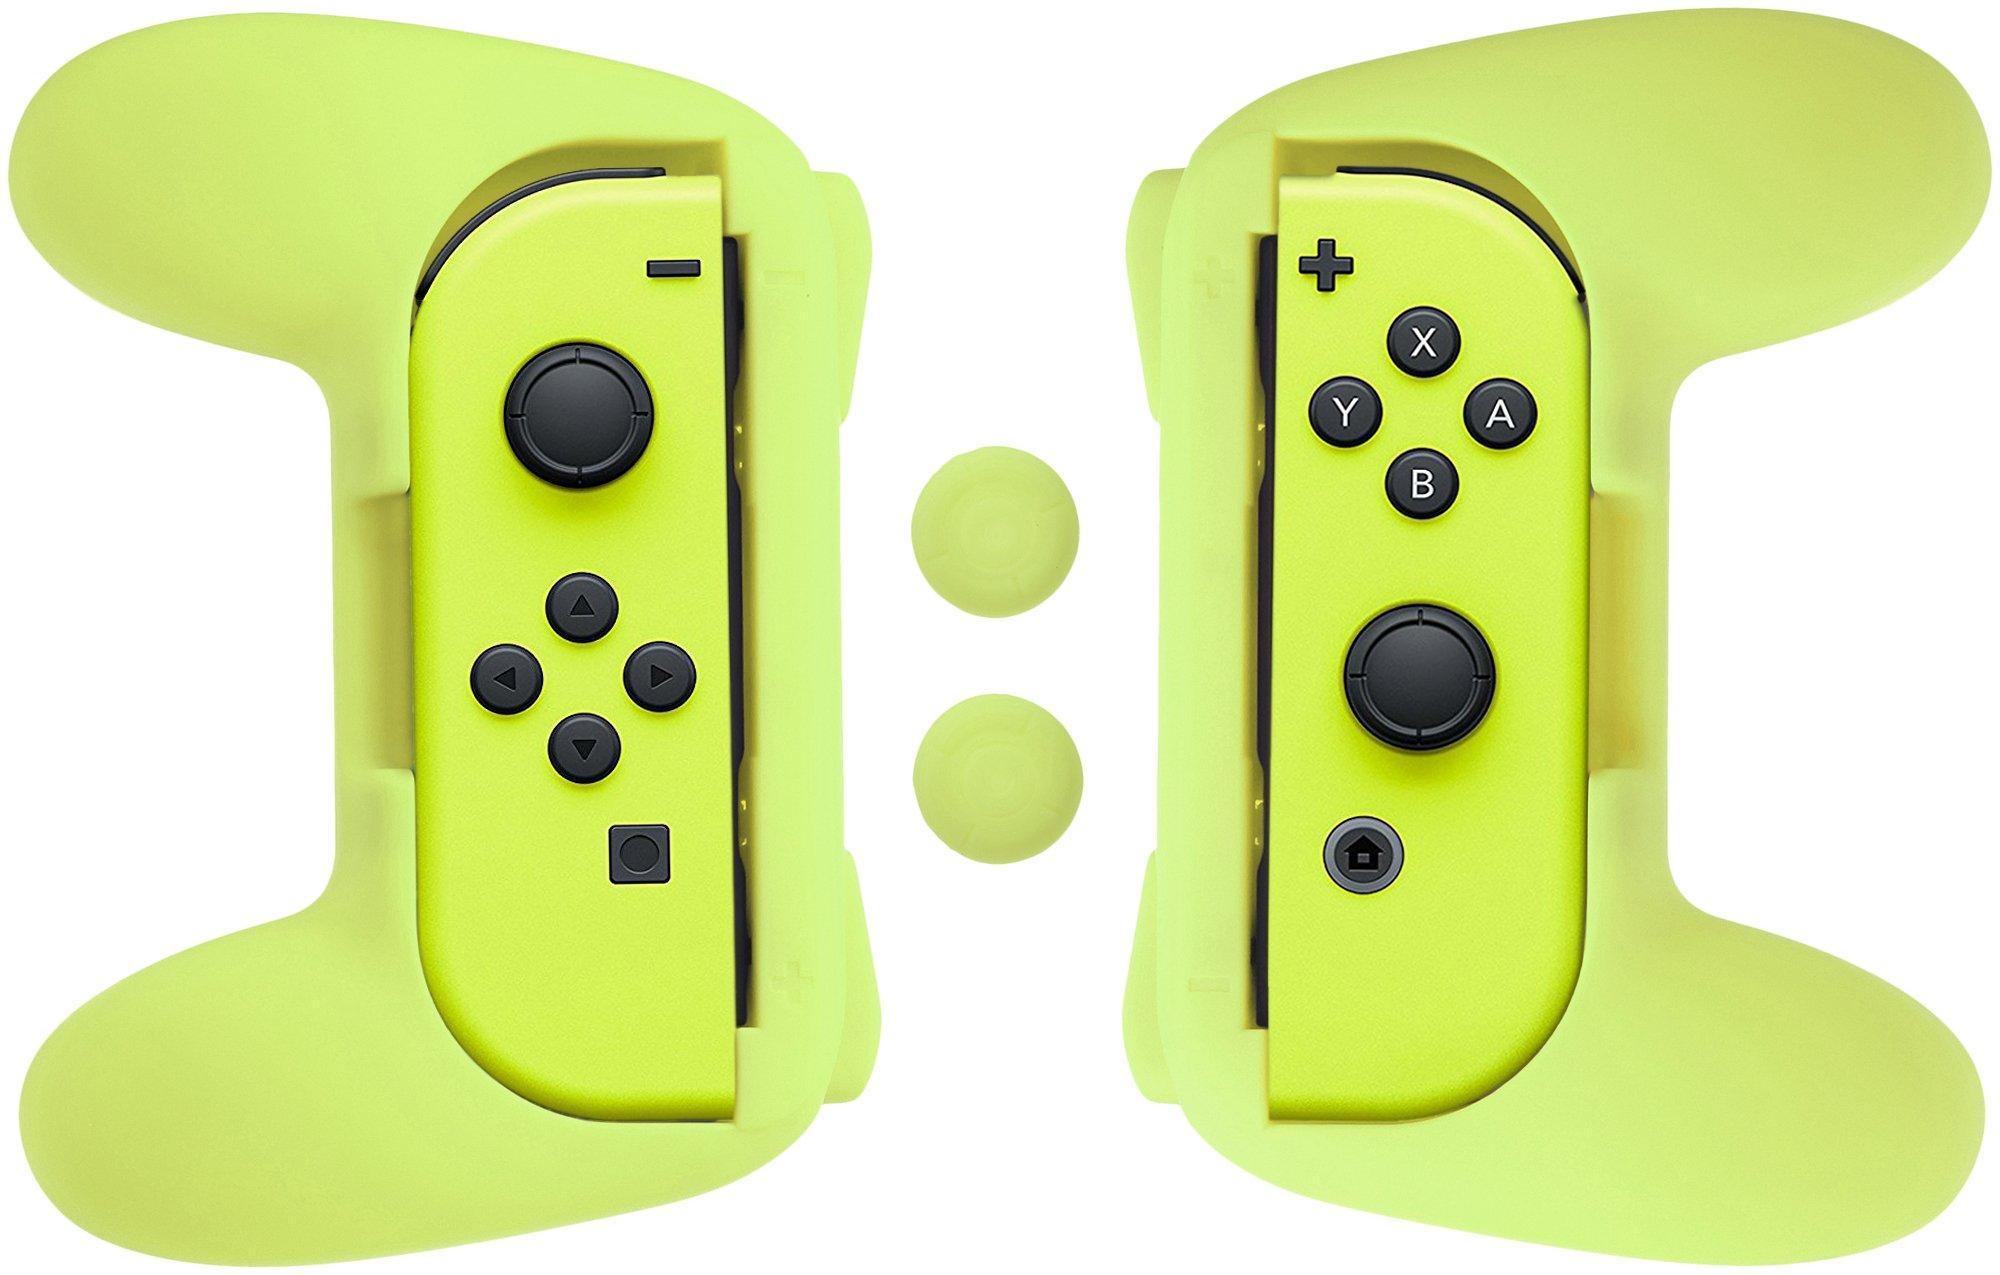 AmazonBasics Grip Kit for Nintendo Switch Joy-Con Controllers - Yellow product image